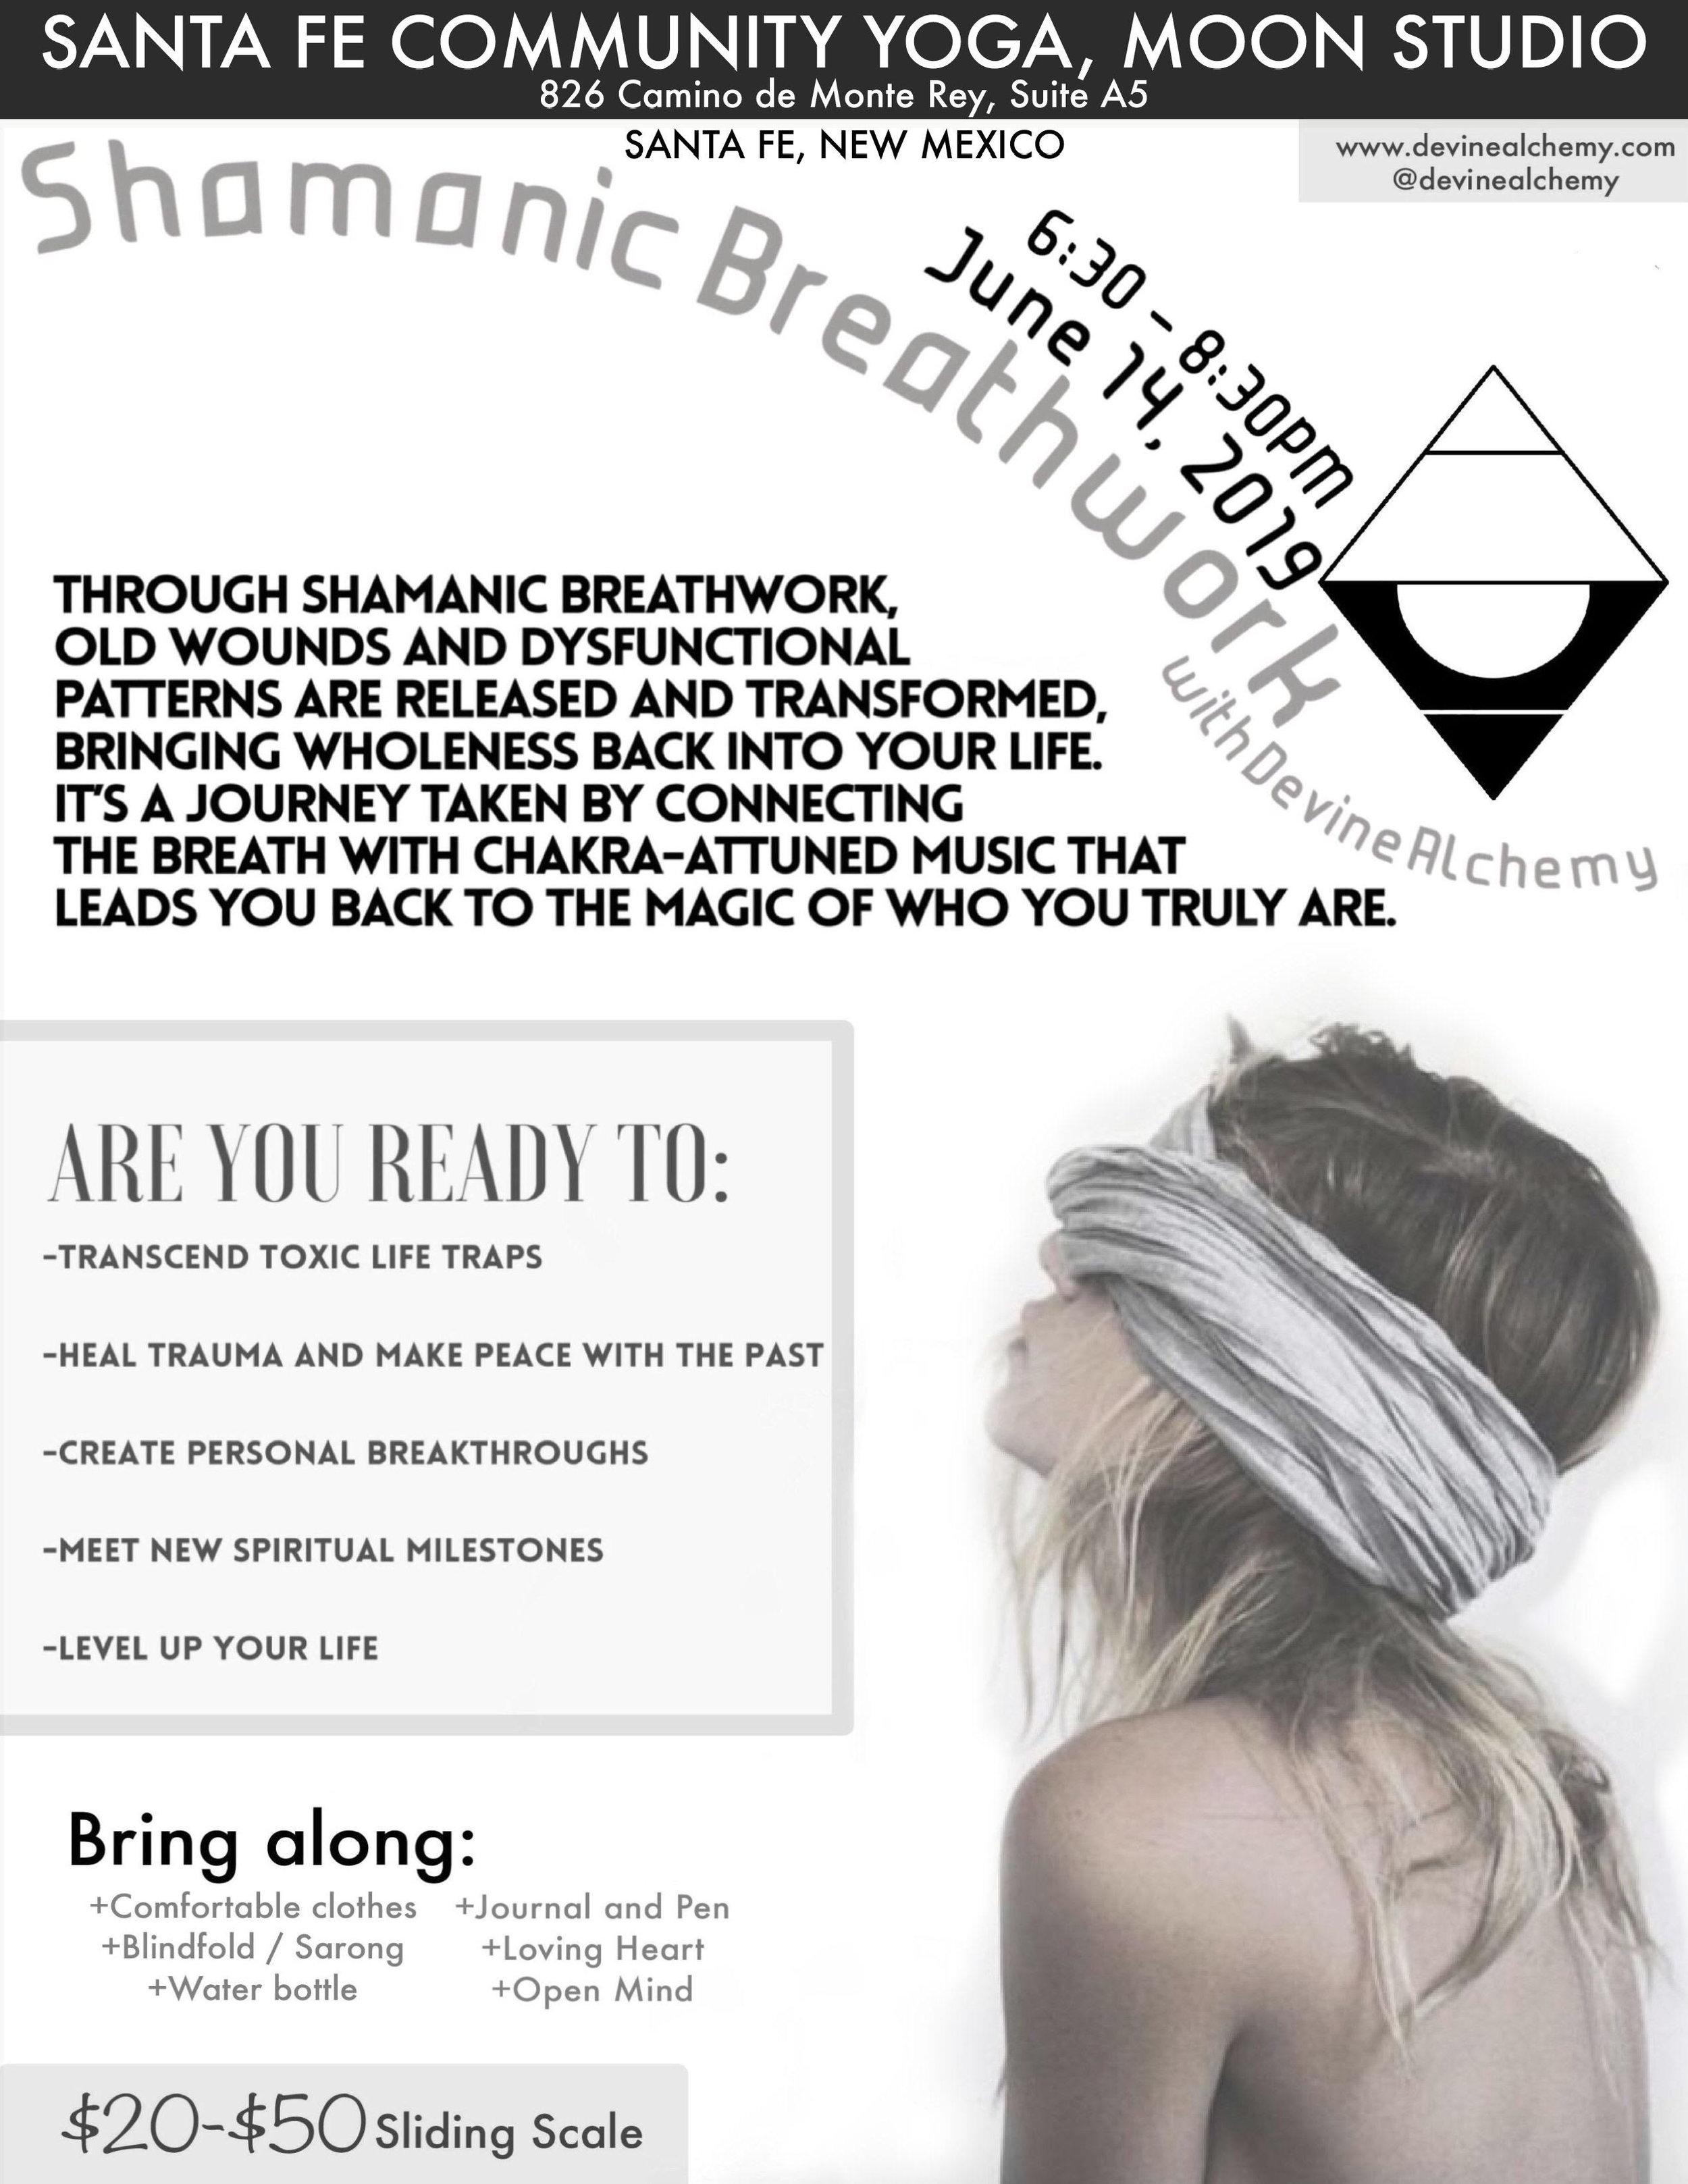 shamanic breathwork santa fe